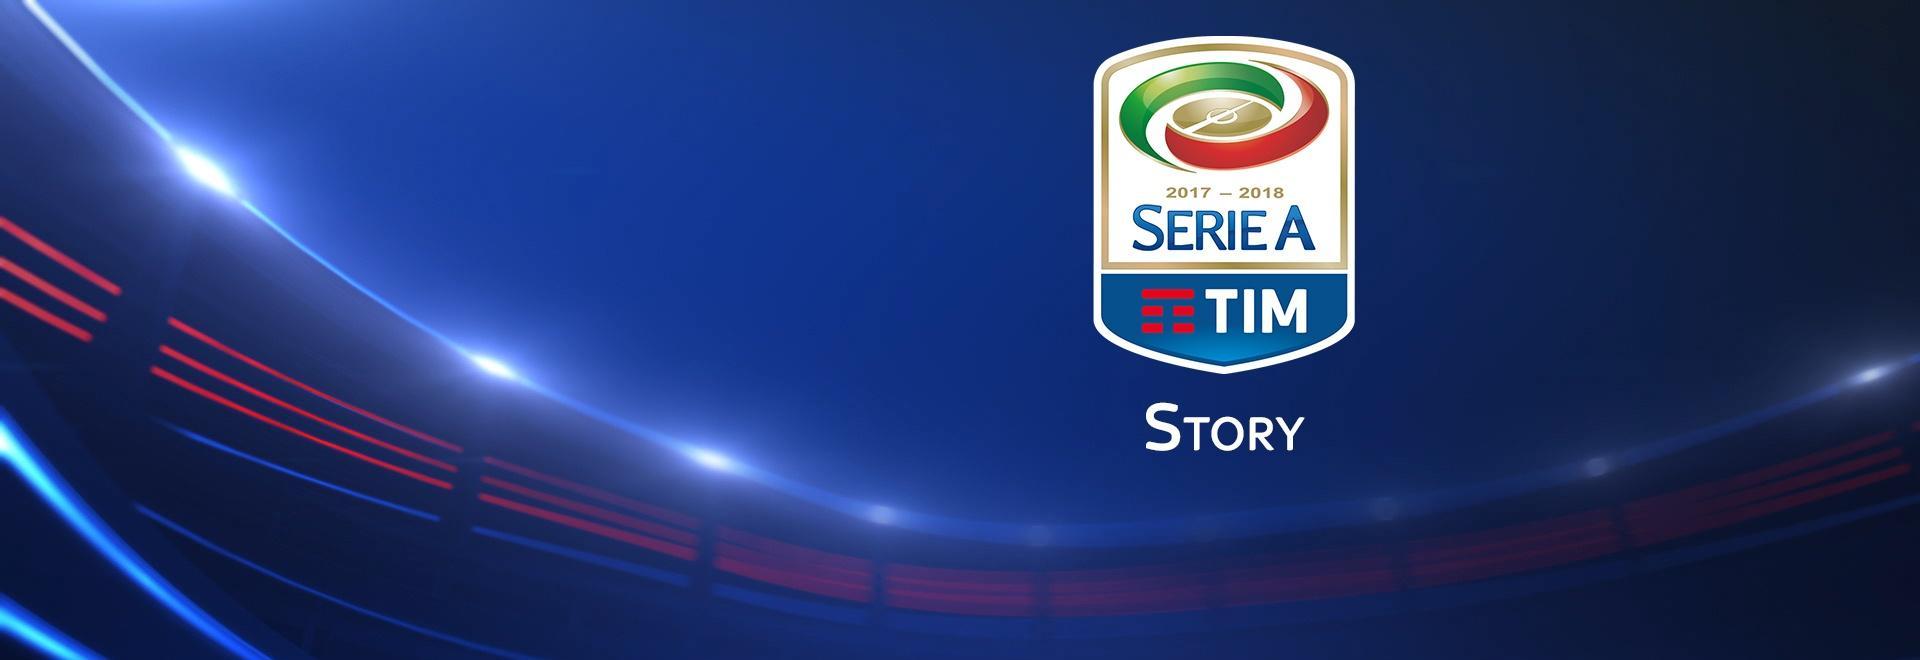 Juventus - Lazio 11/04/12. 32a g.